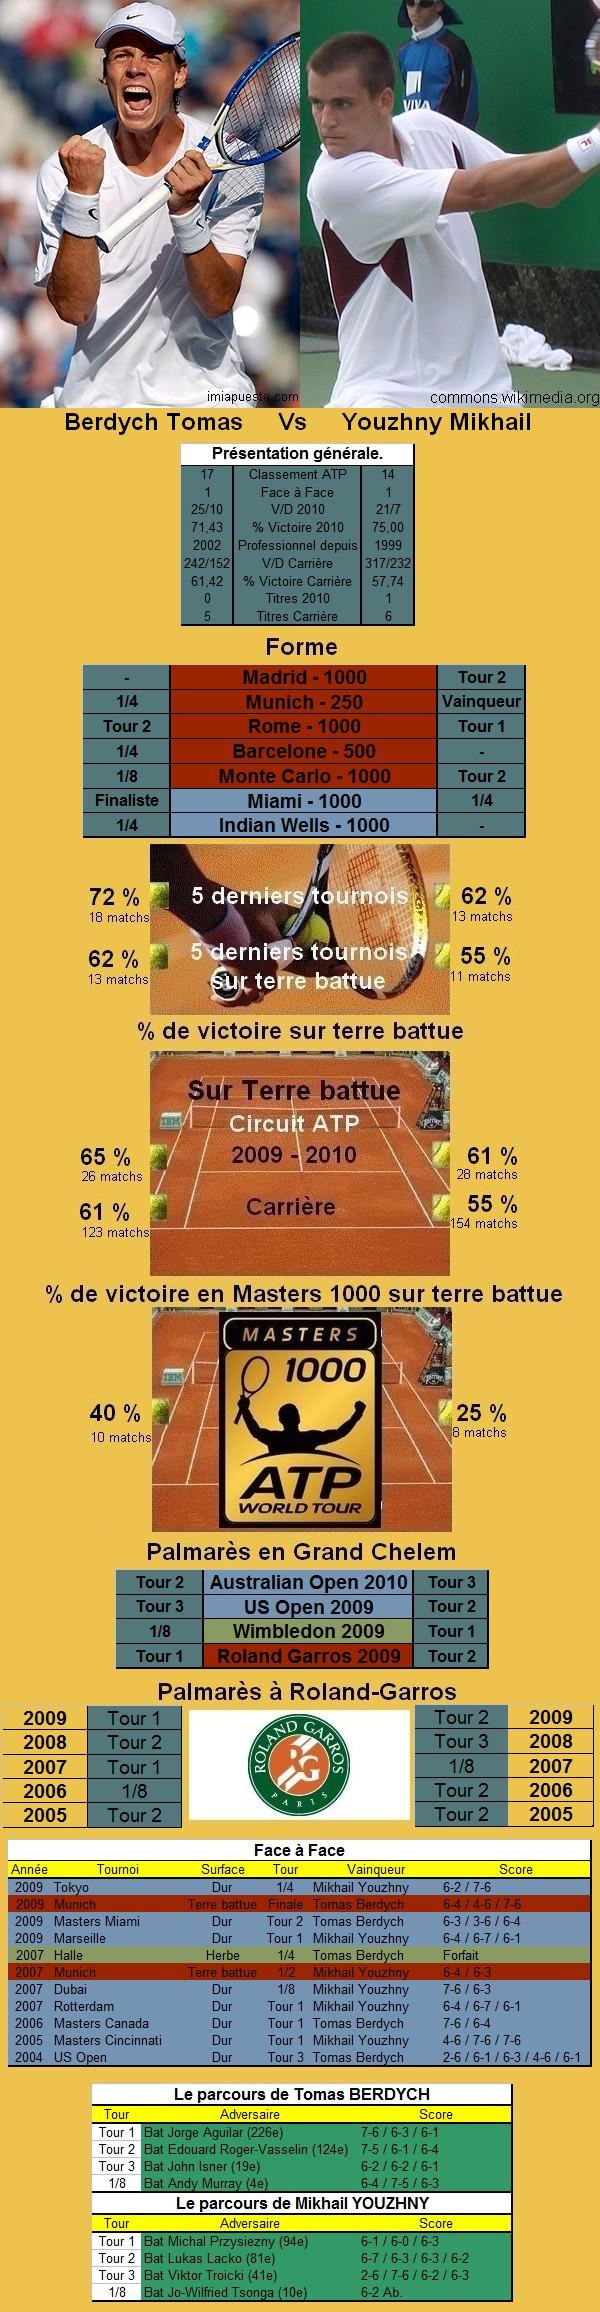 Statistiques tennis de Berdych contre Youzhny à Roland Garros